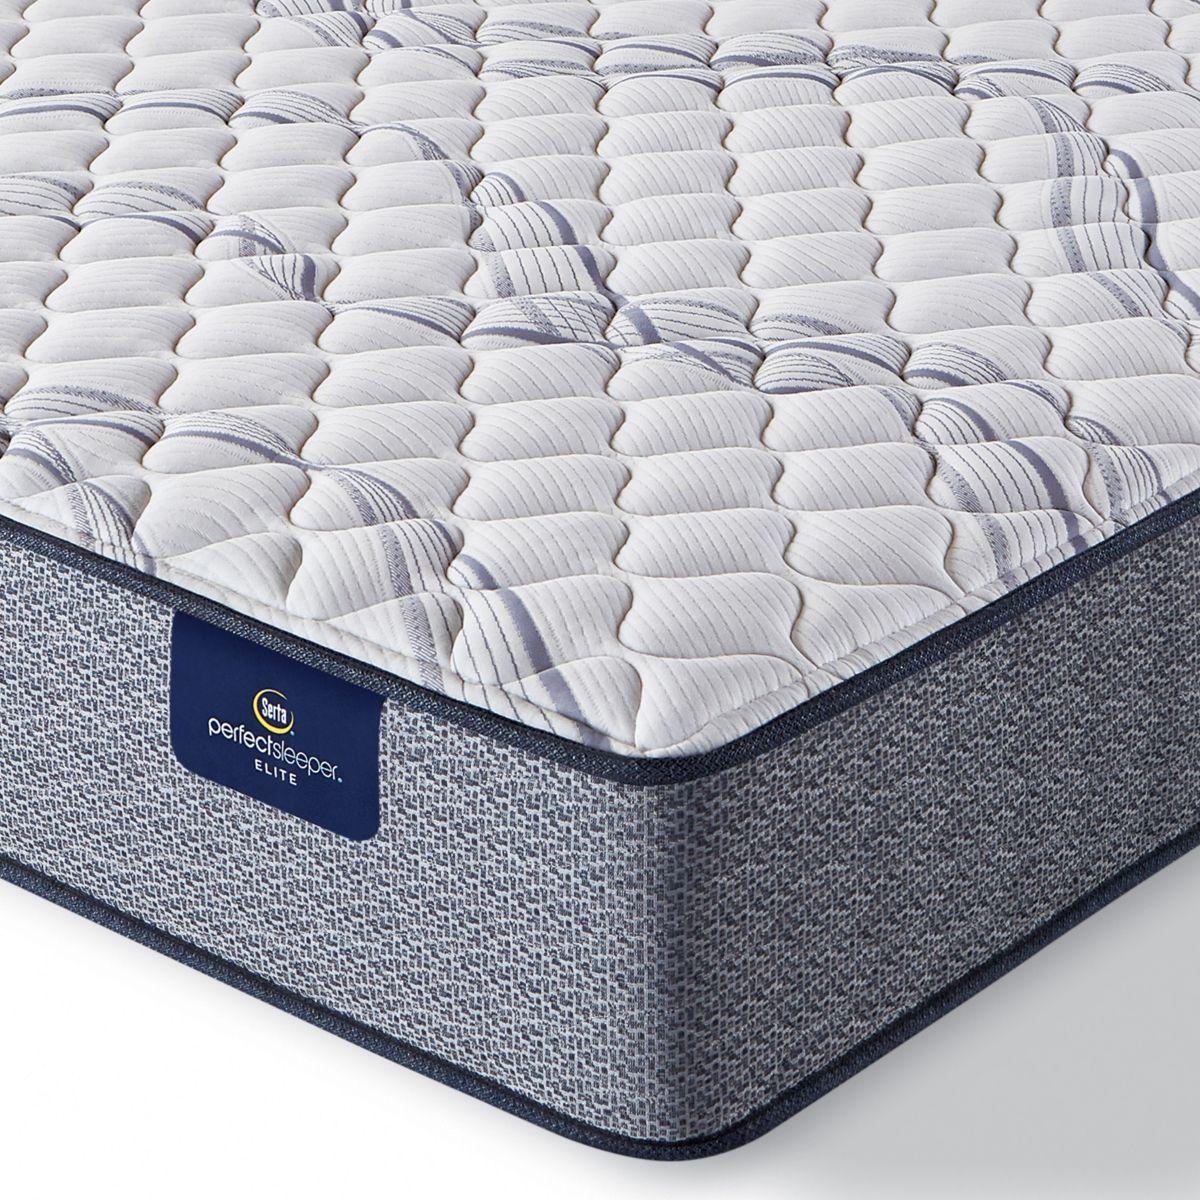 Serta Perfect Sleeper Trelleburg Ii 12 5 Extra Firm Mattress